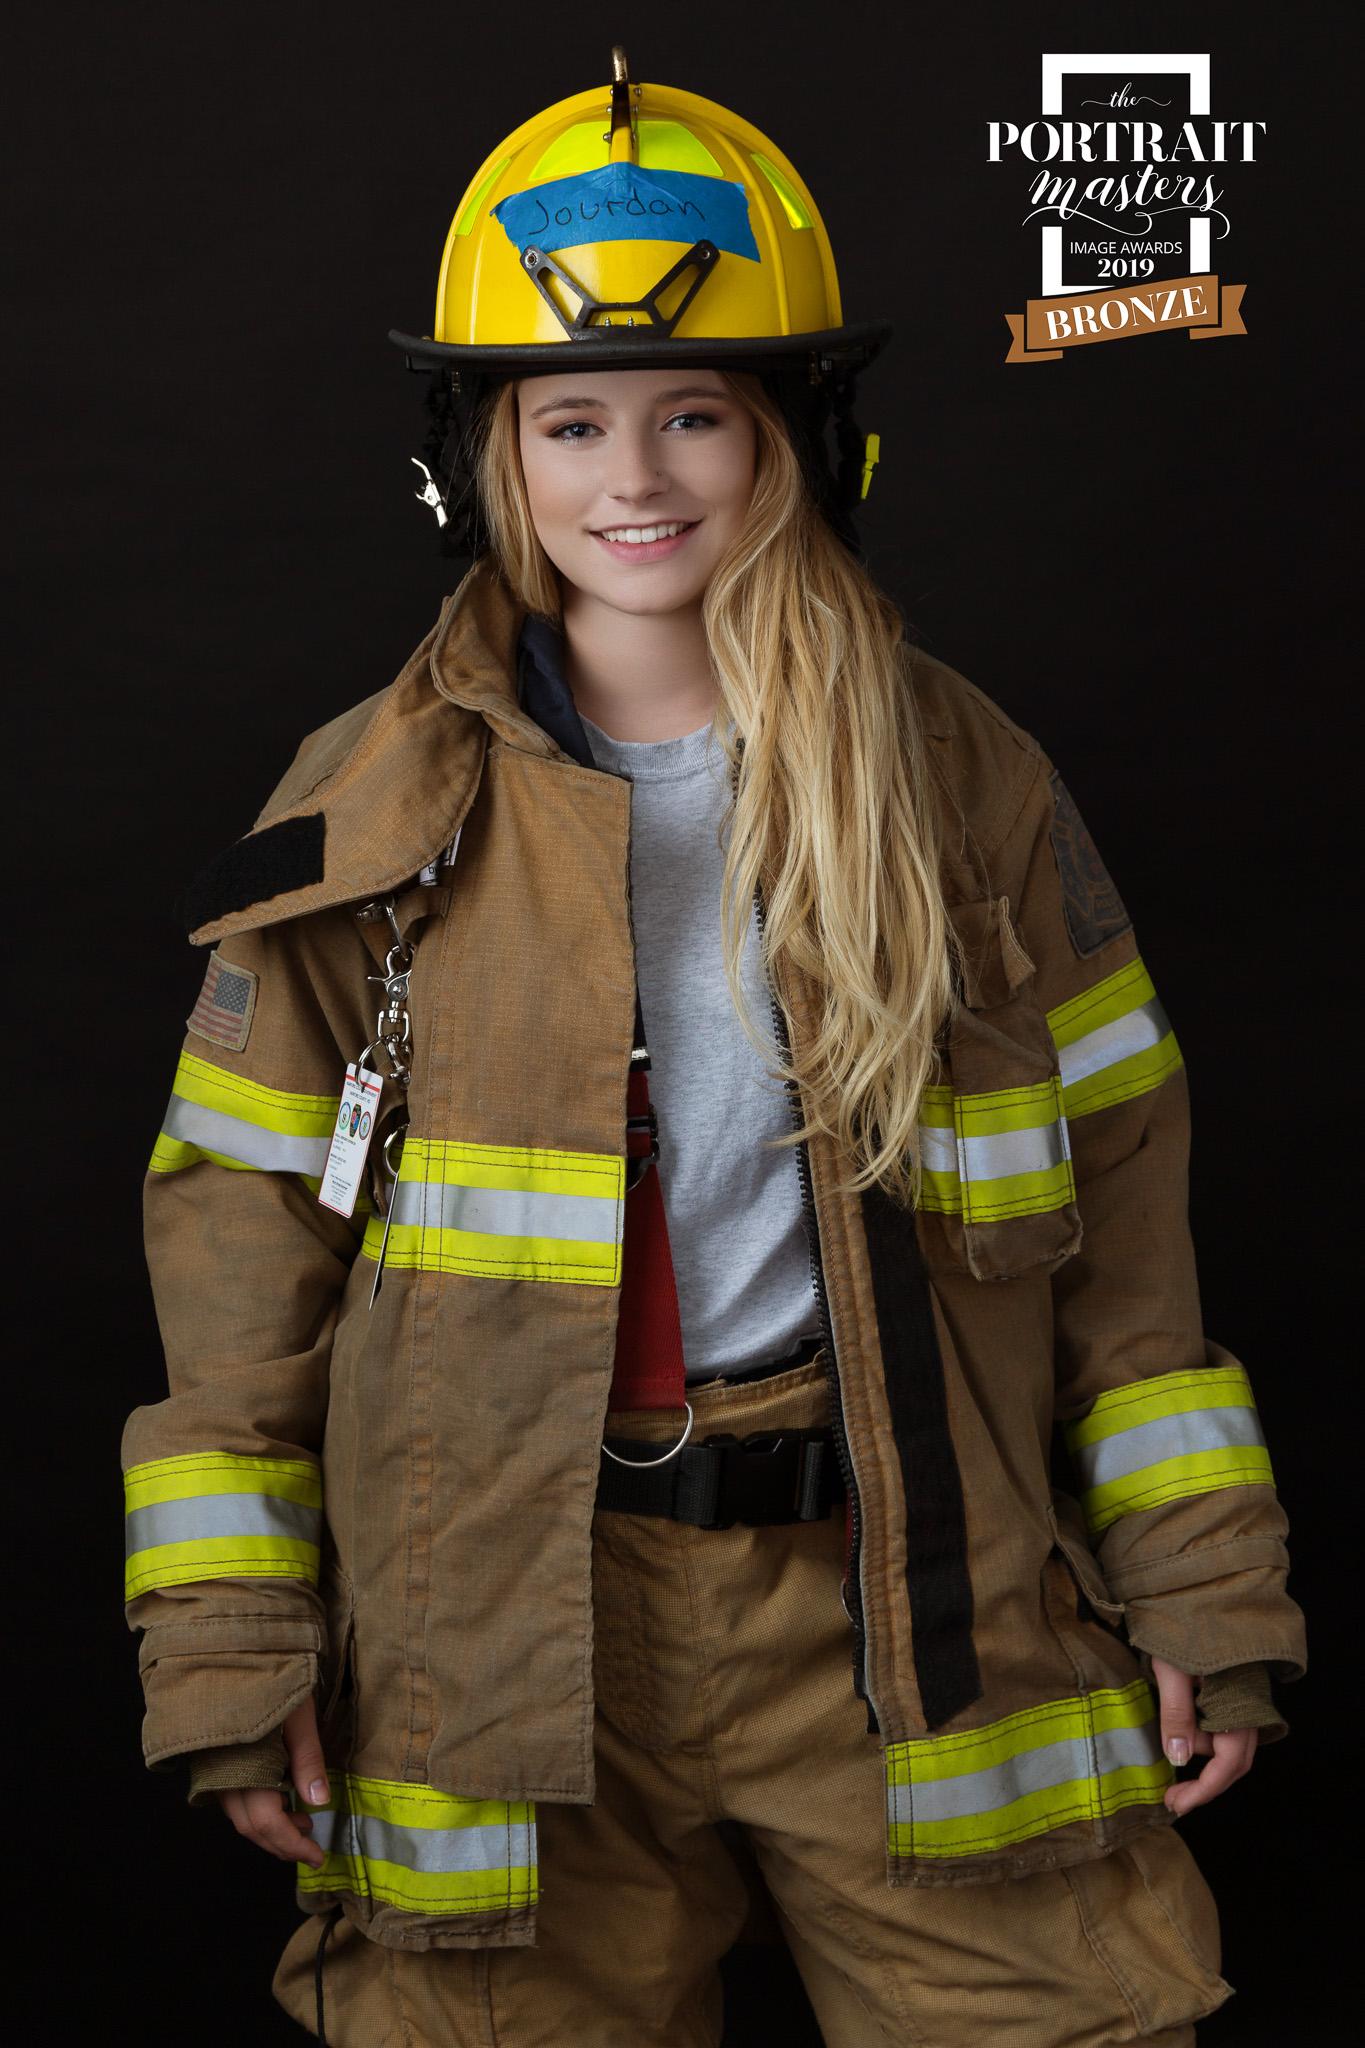 Firefighterbronzeaward (1 of 1).jpg